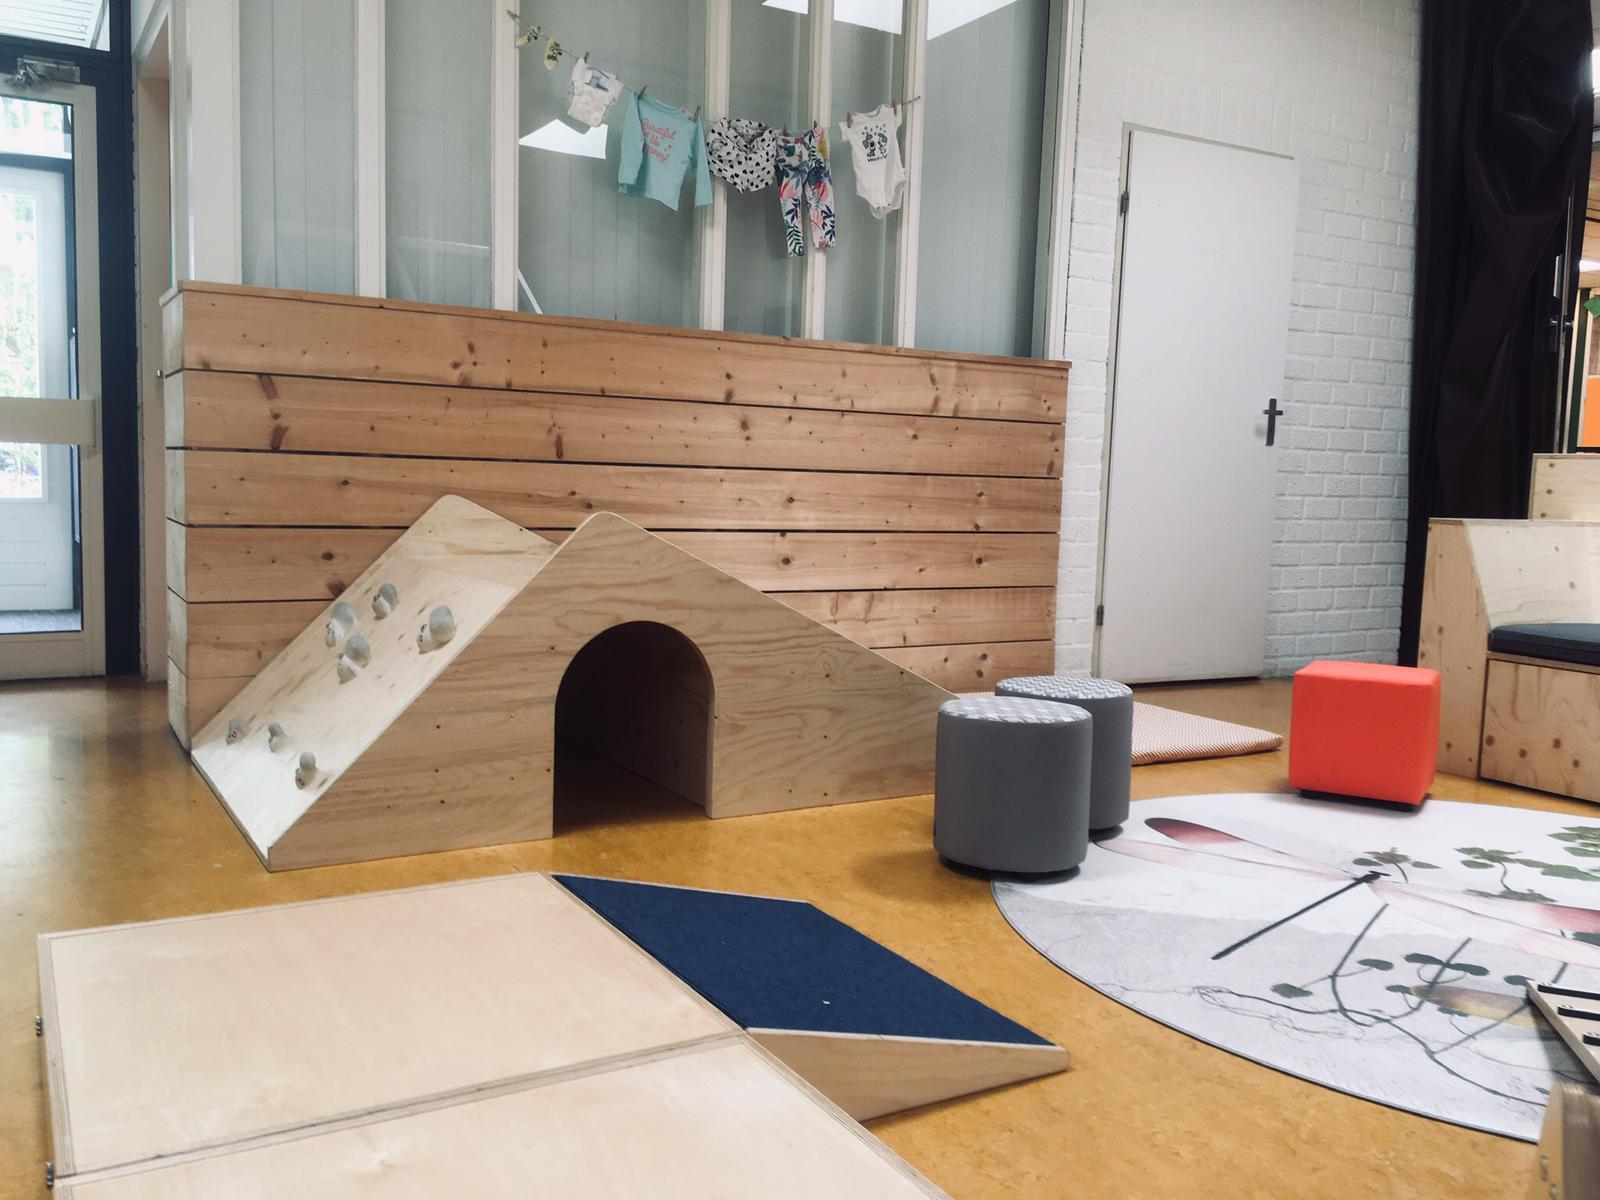 Interieur kindcentrum Waterwereld